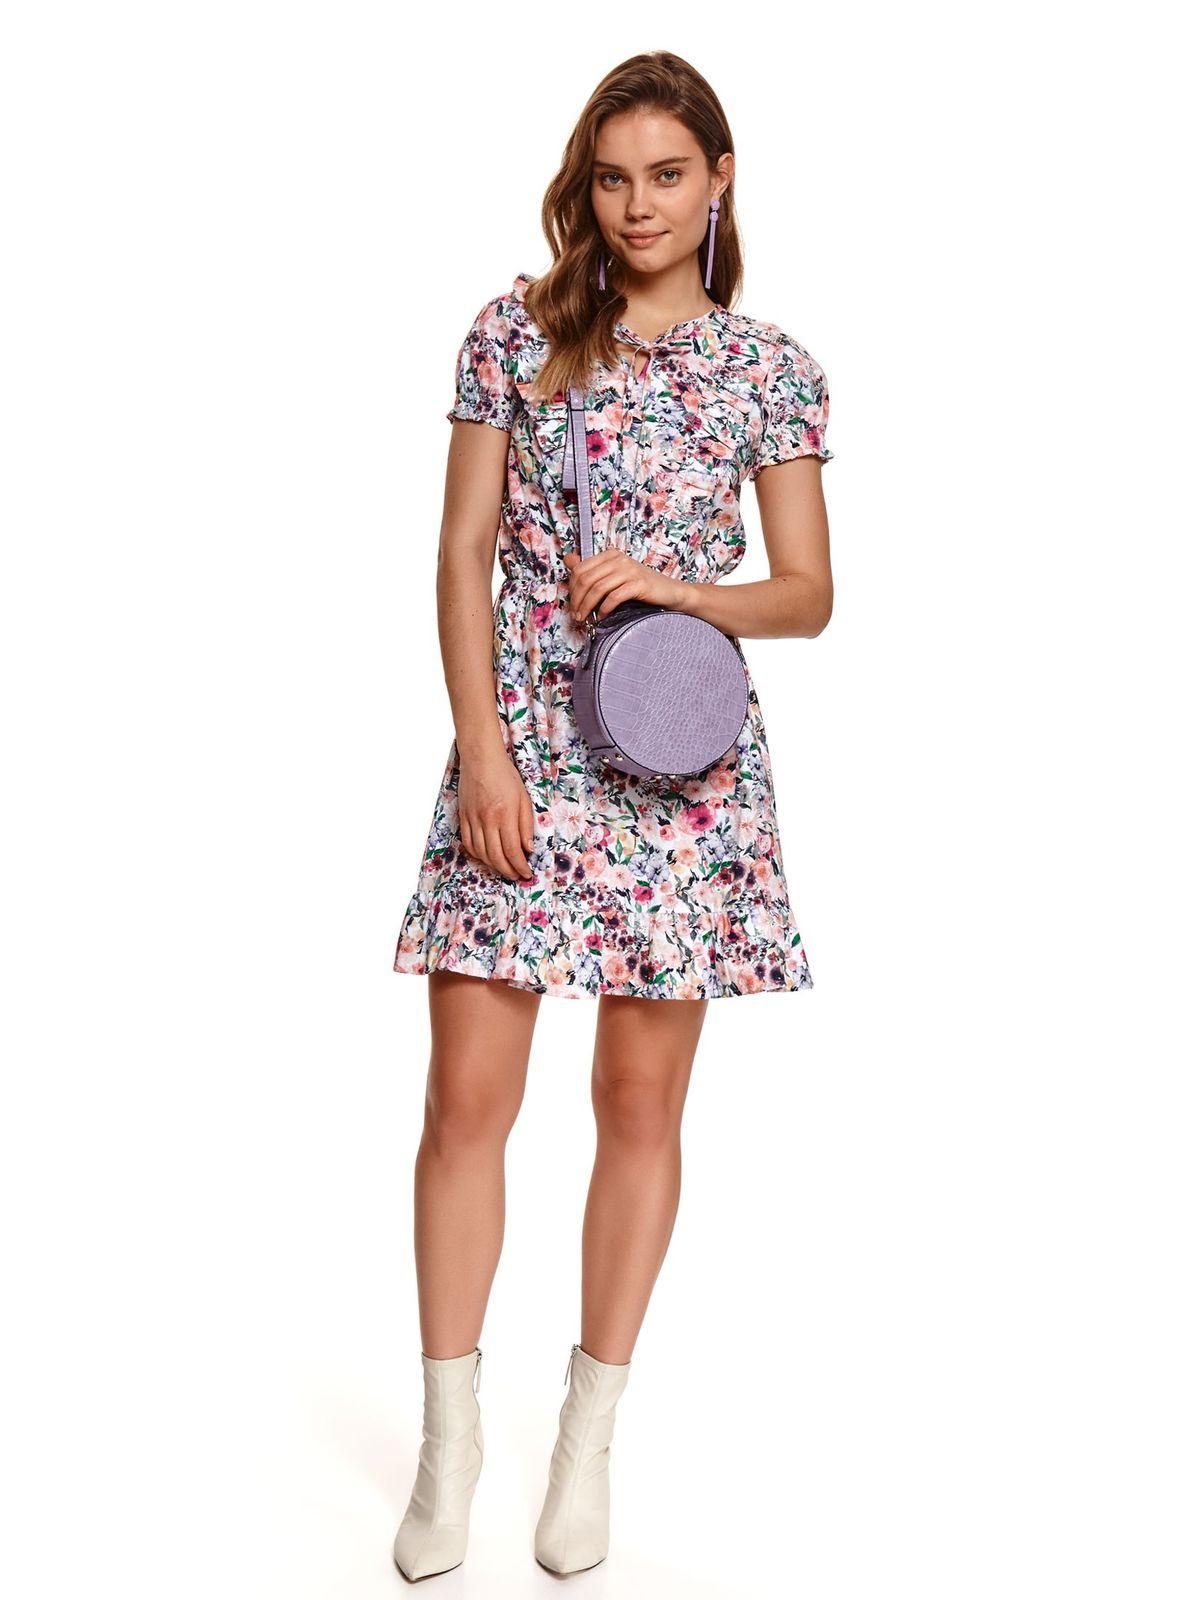 Lightgrey dress short cut cloche with elastic waist short sleeves